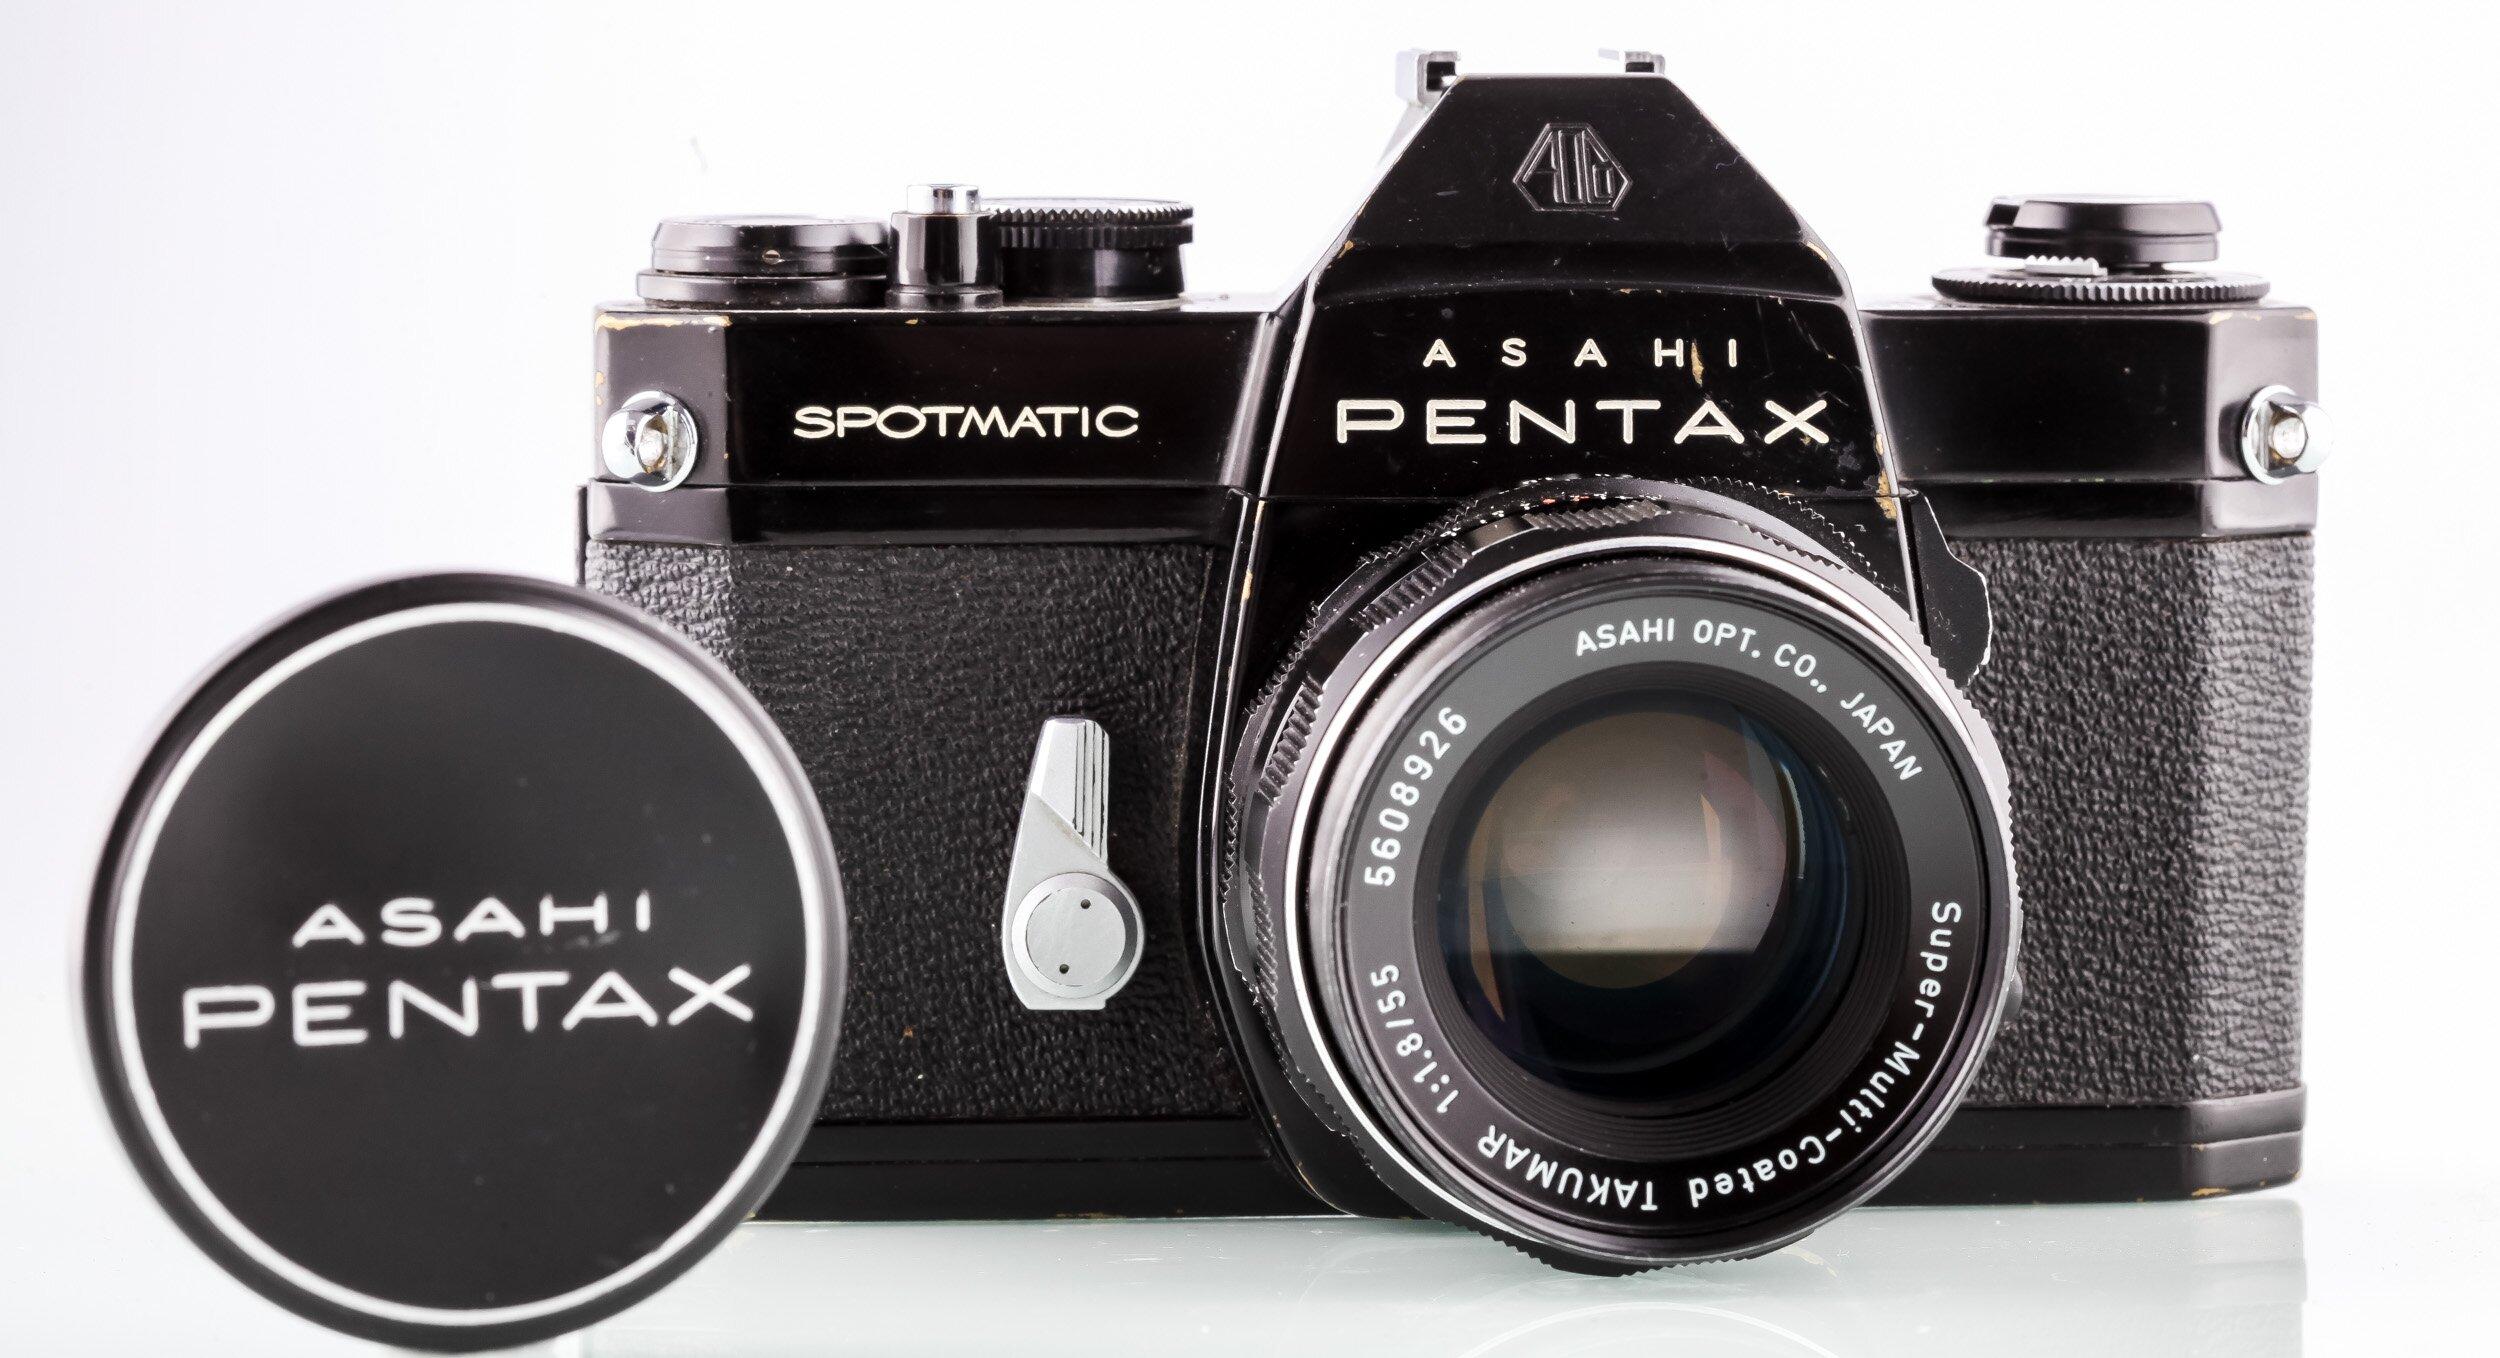 Pentax Spotmatic SP II+ Super-Multi-Coated Takumar 1,8/55mm